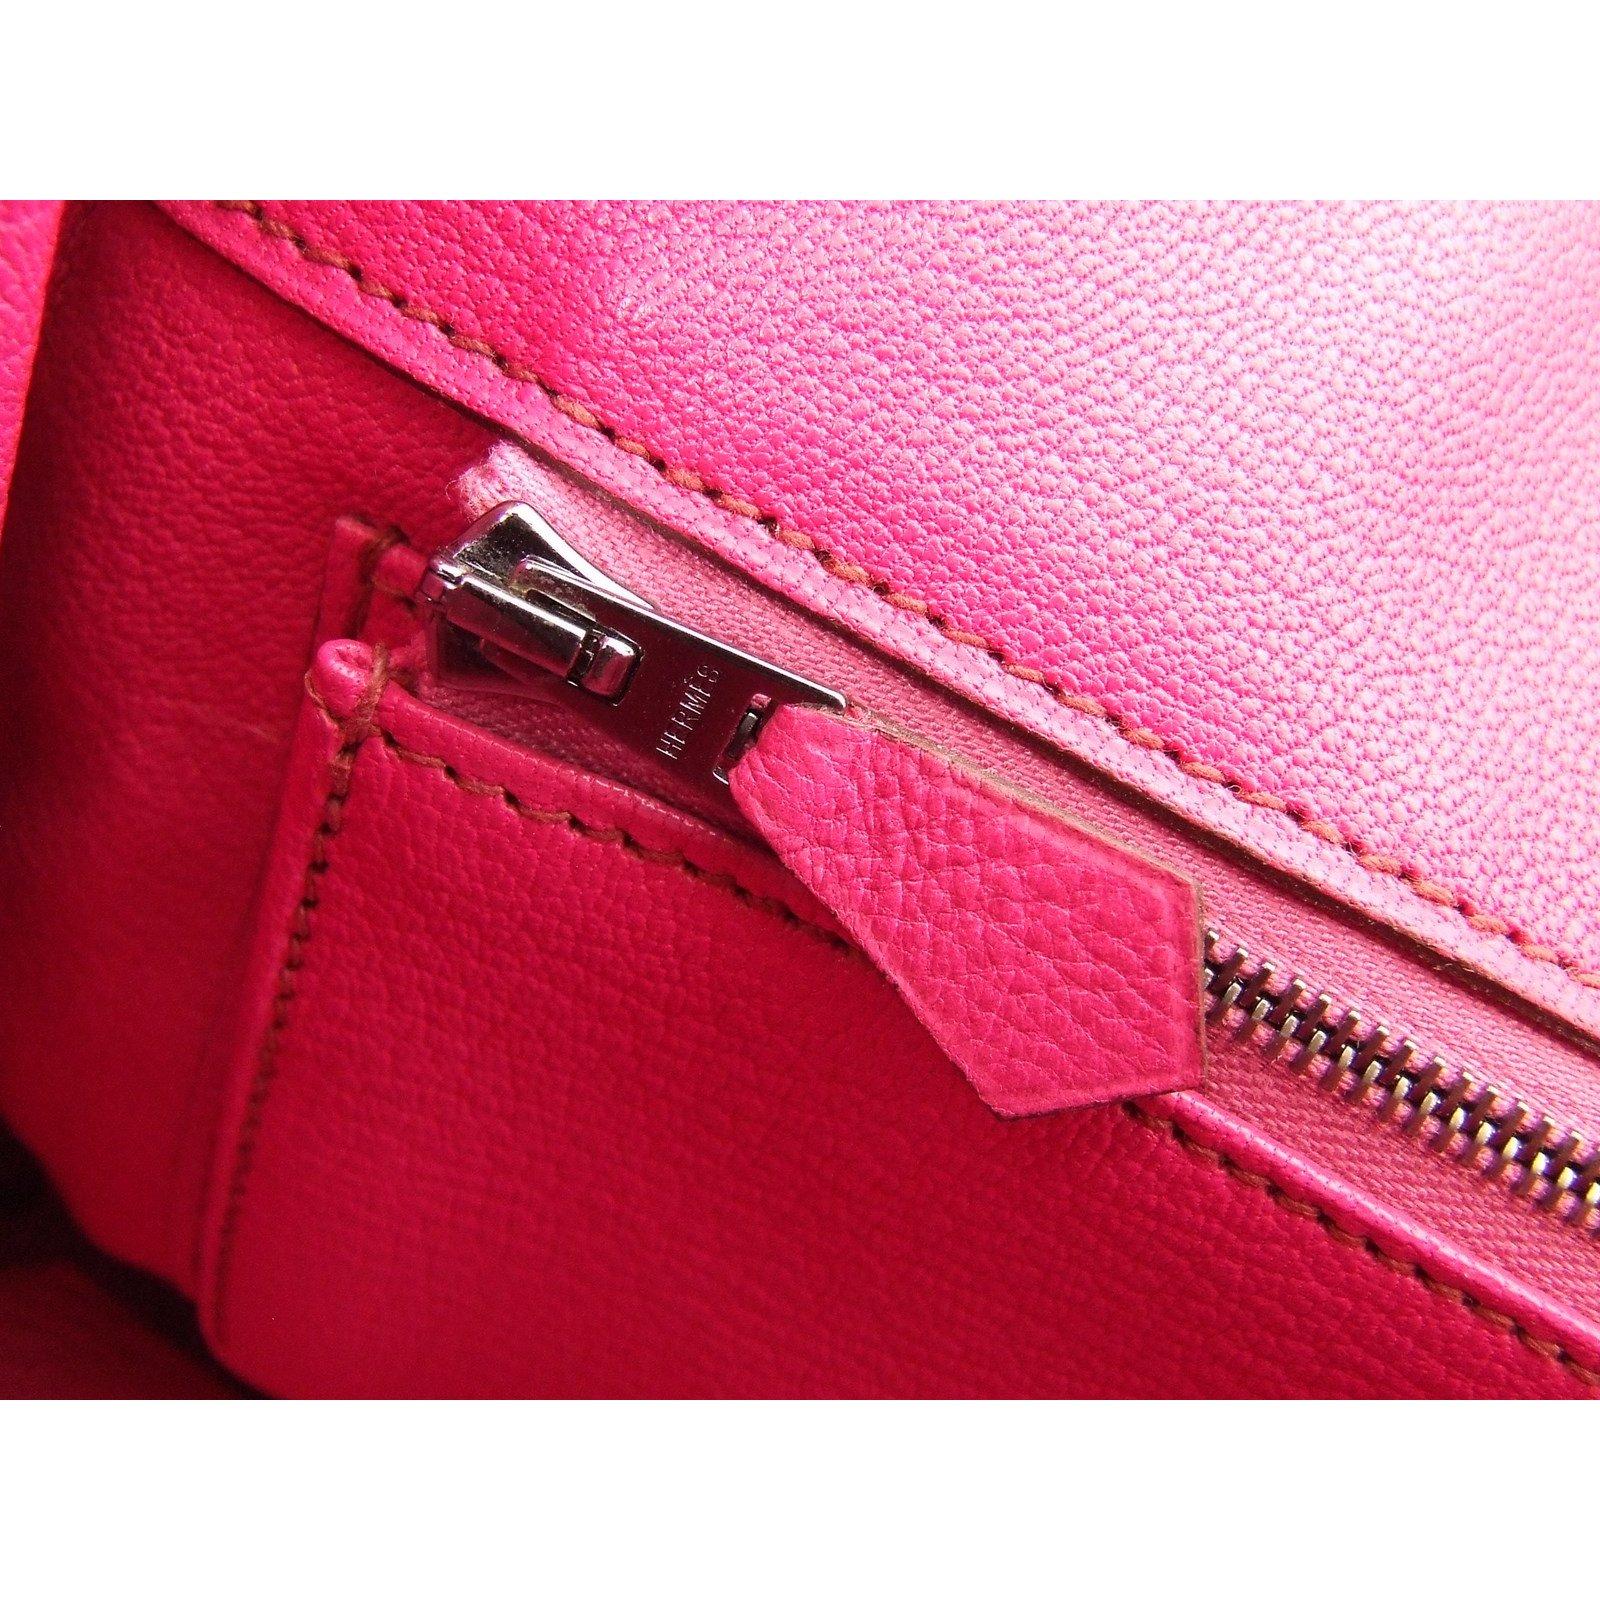 c85a42728447 Hermès Hermès Birkin 25 Handbags Exotic leather Pink ref.48556 - Joli Closet